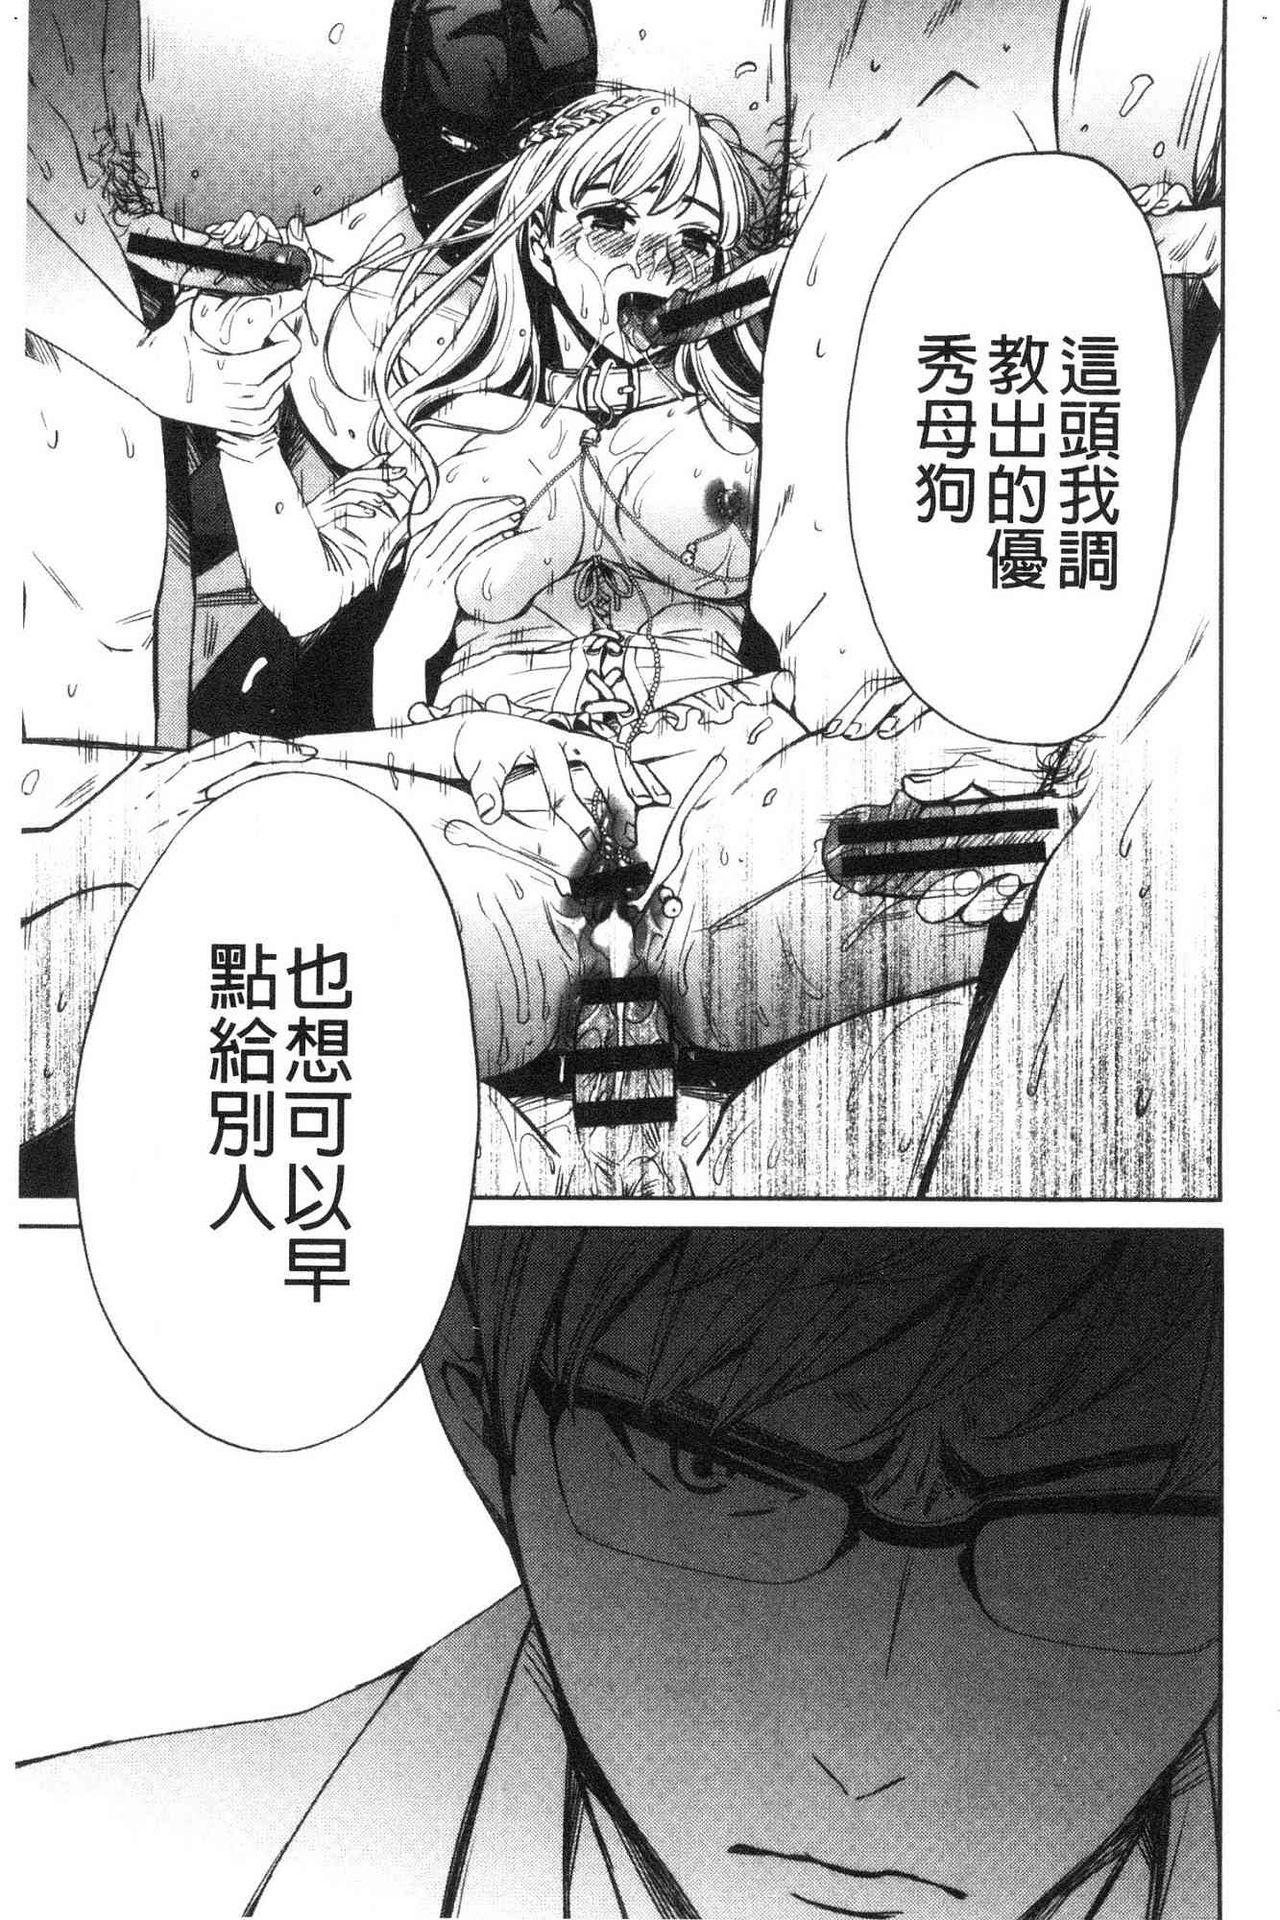 [Gotoh Akira]  21-ji no Onna ~Camera no Mae no Mesuinu~ 2 | 21時之女 ~鏡頭前的牝犬~ 2 [Chinese] 184